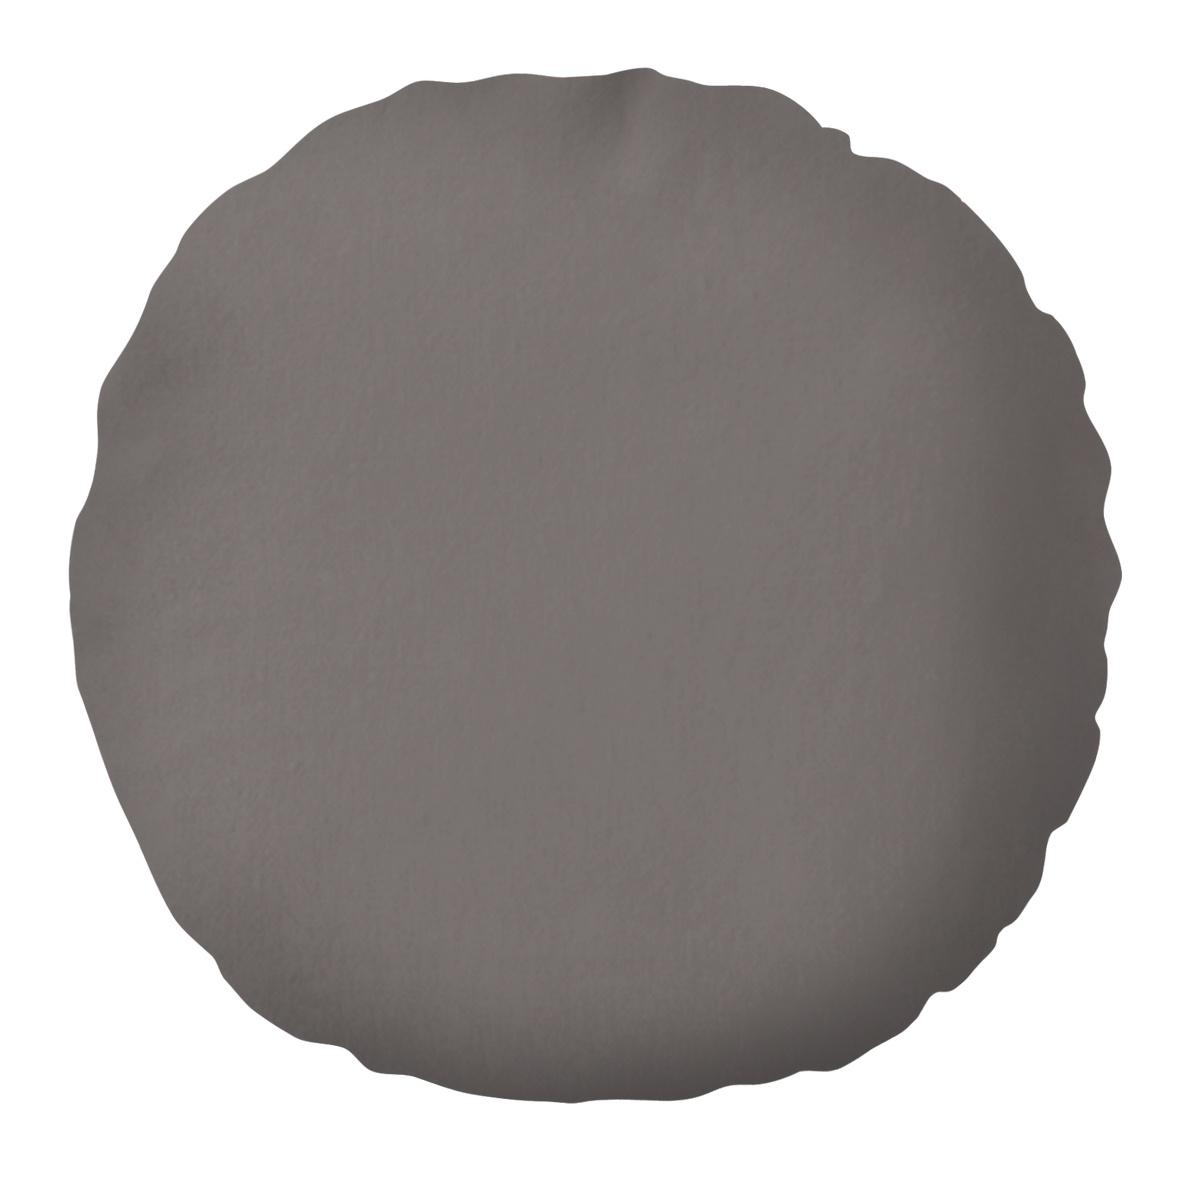 Domarex Polštář kulatý Velvet šedá, 50 cm